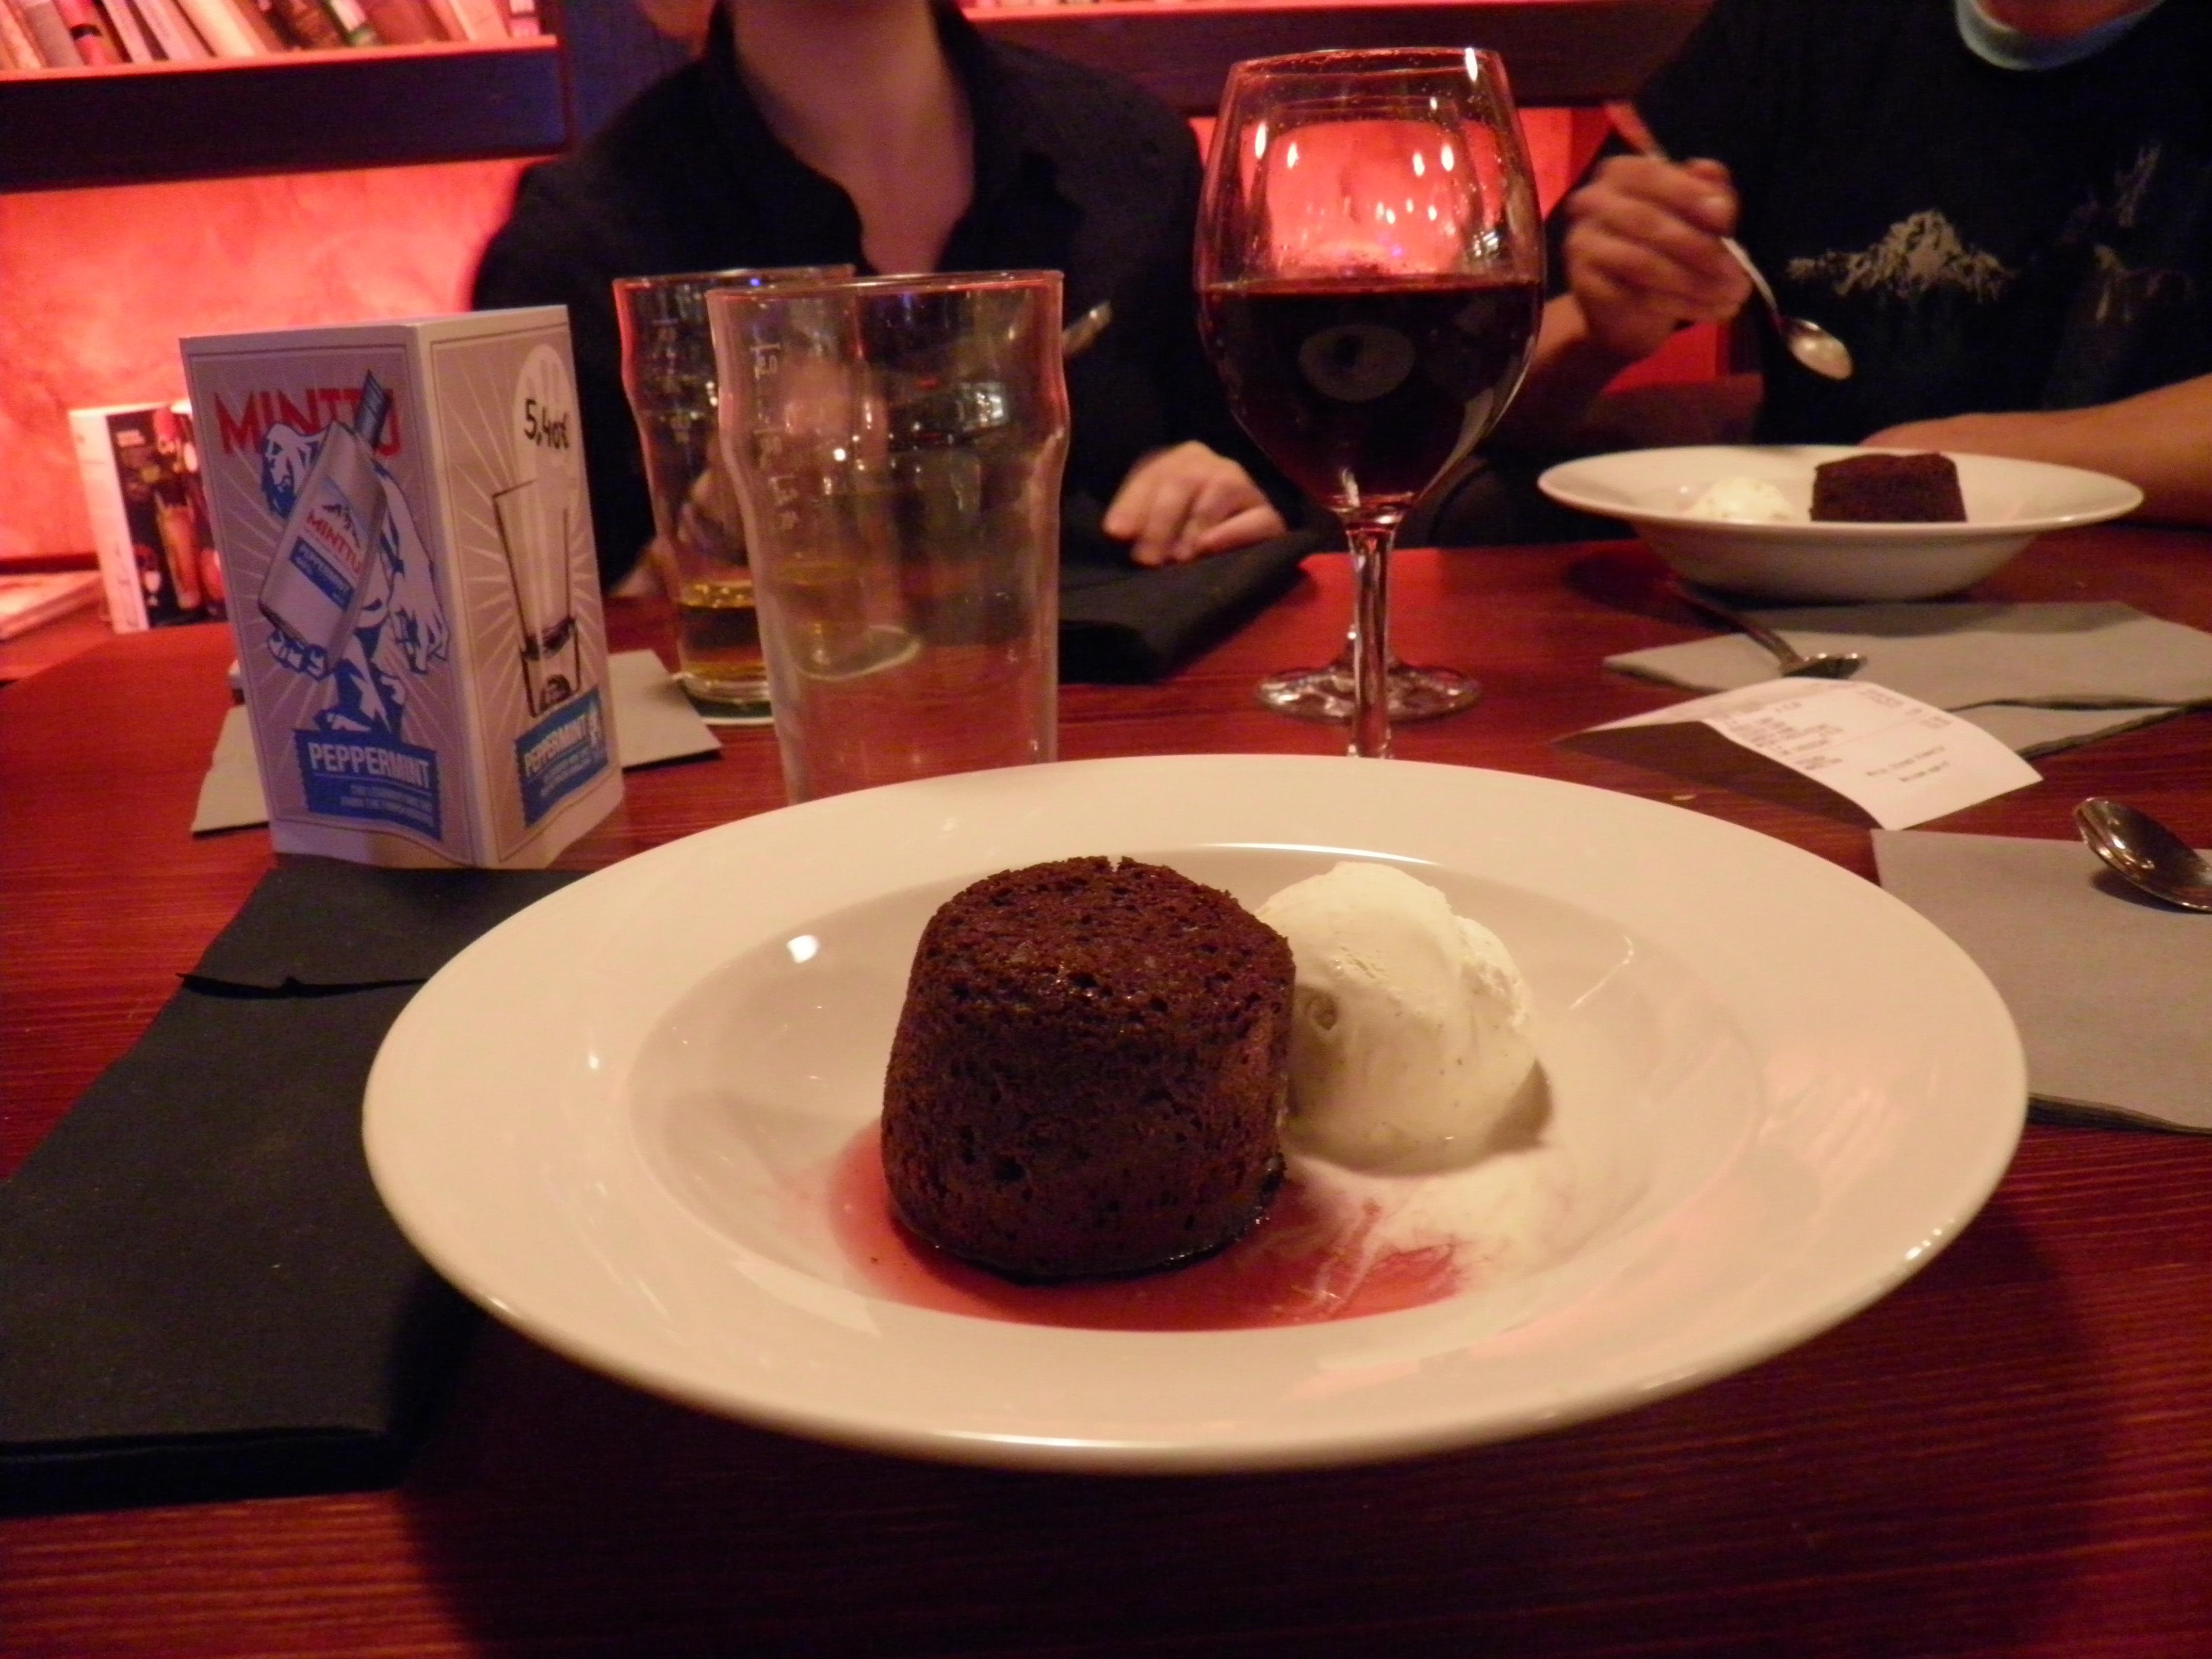 Stone's beer & burgers, Helsinki: Whiskey-chocolate cake